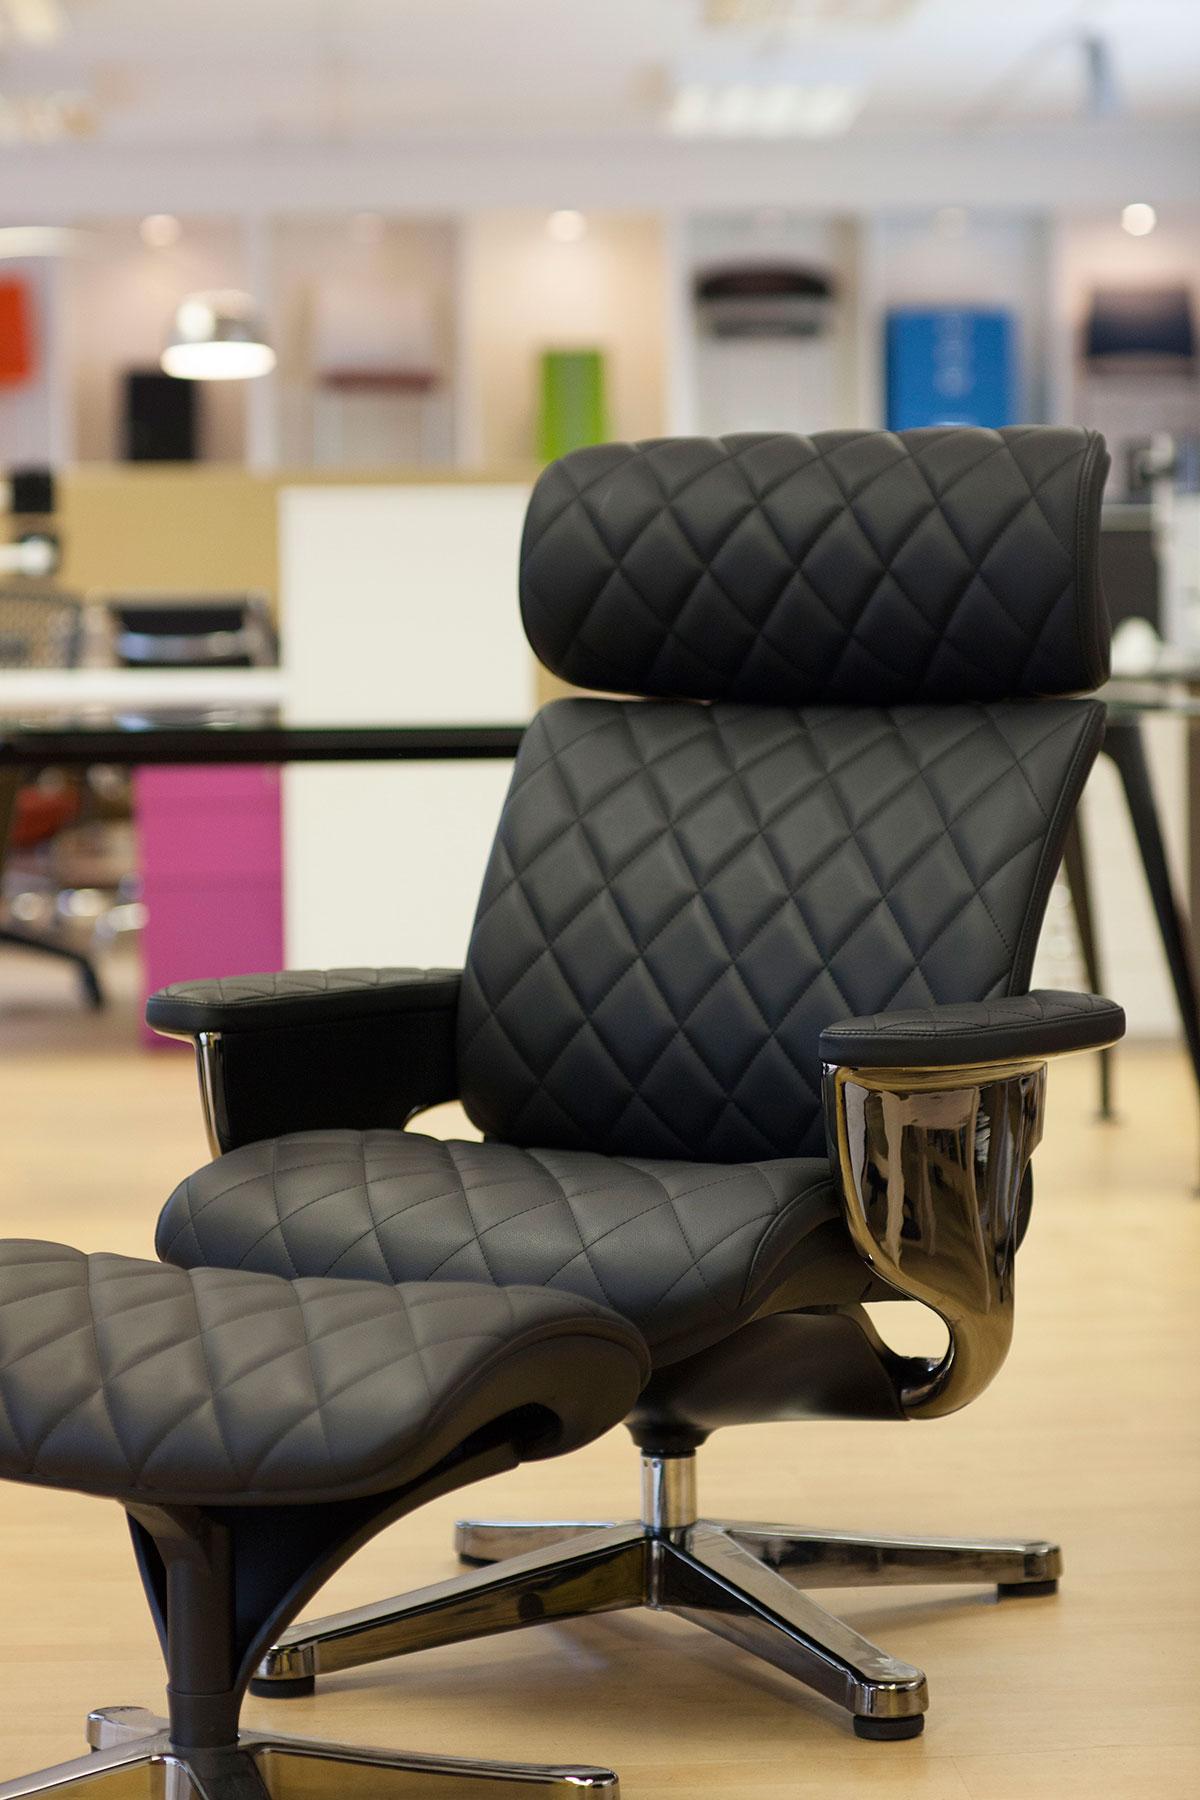 Ergohuman Orange mesh task chair with laptop holder and